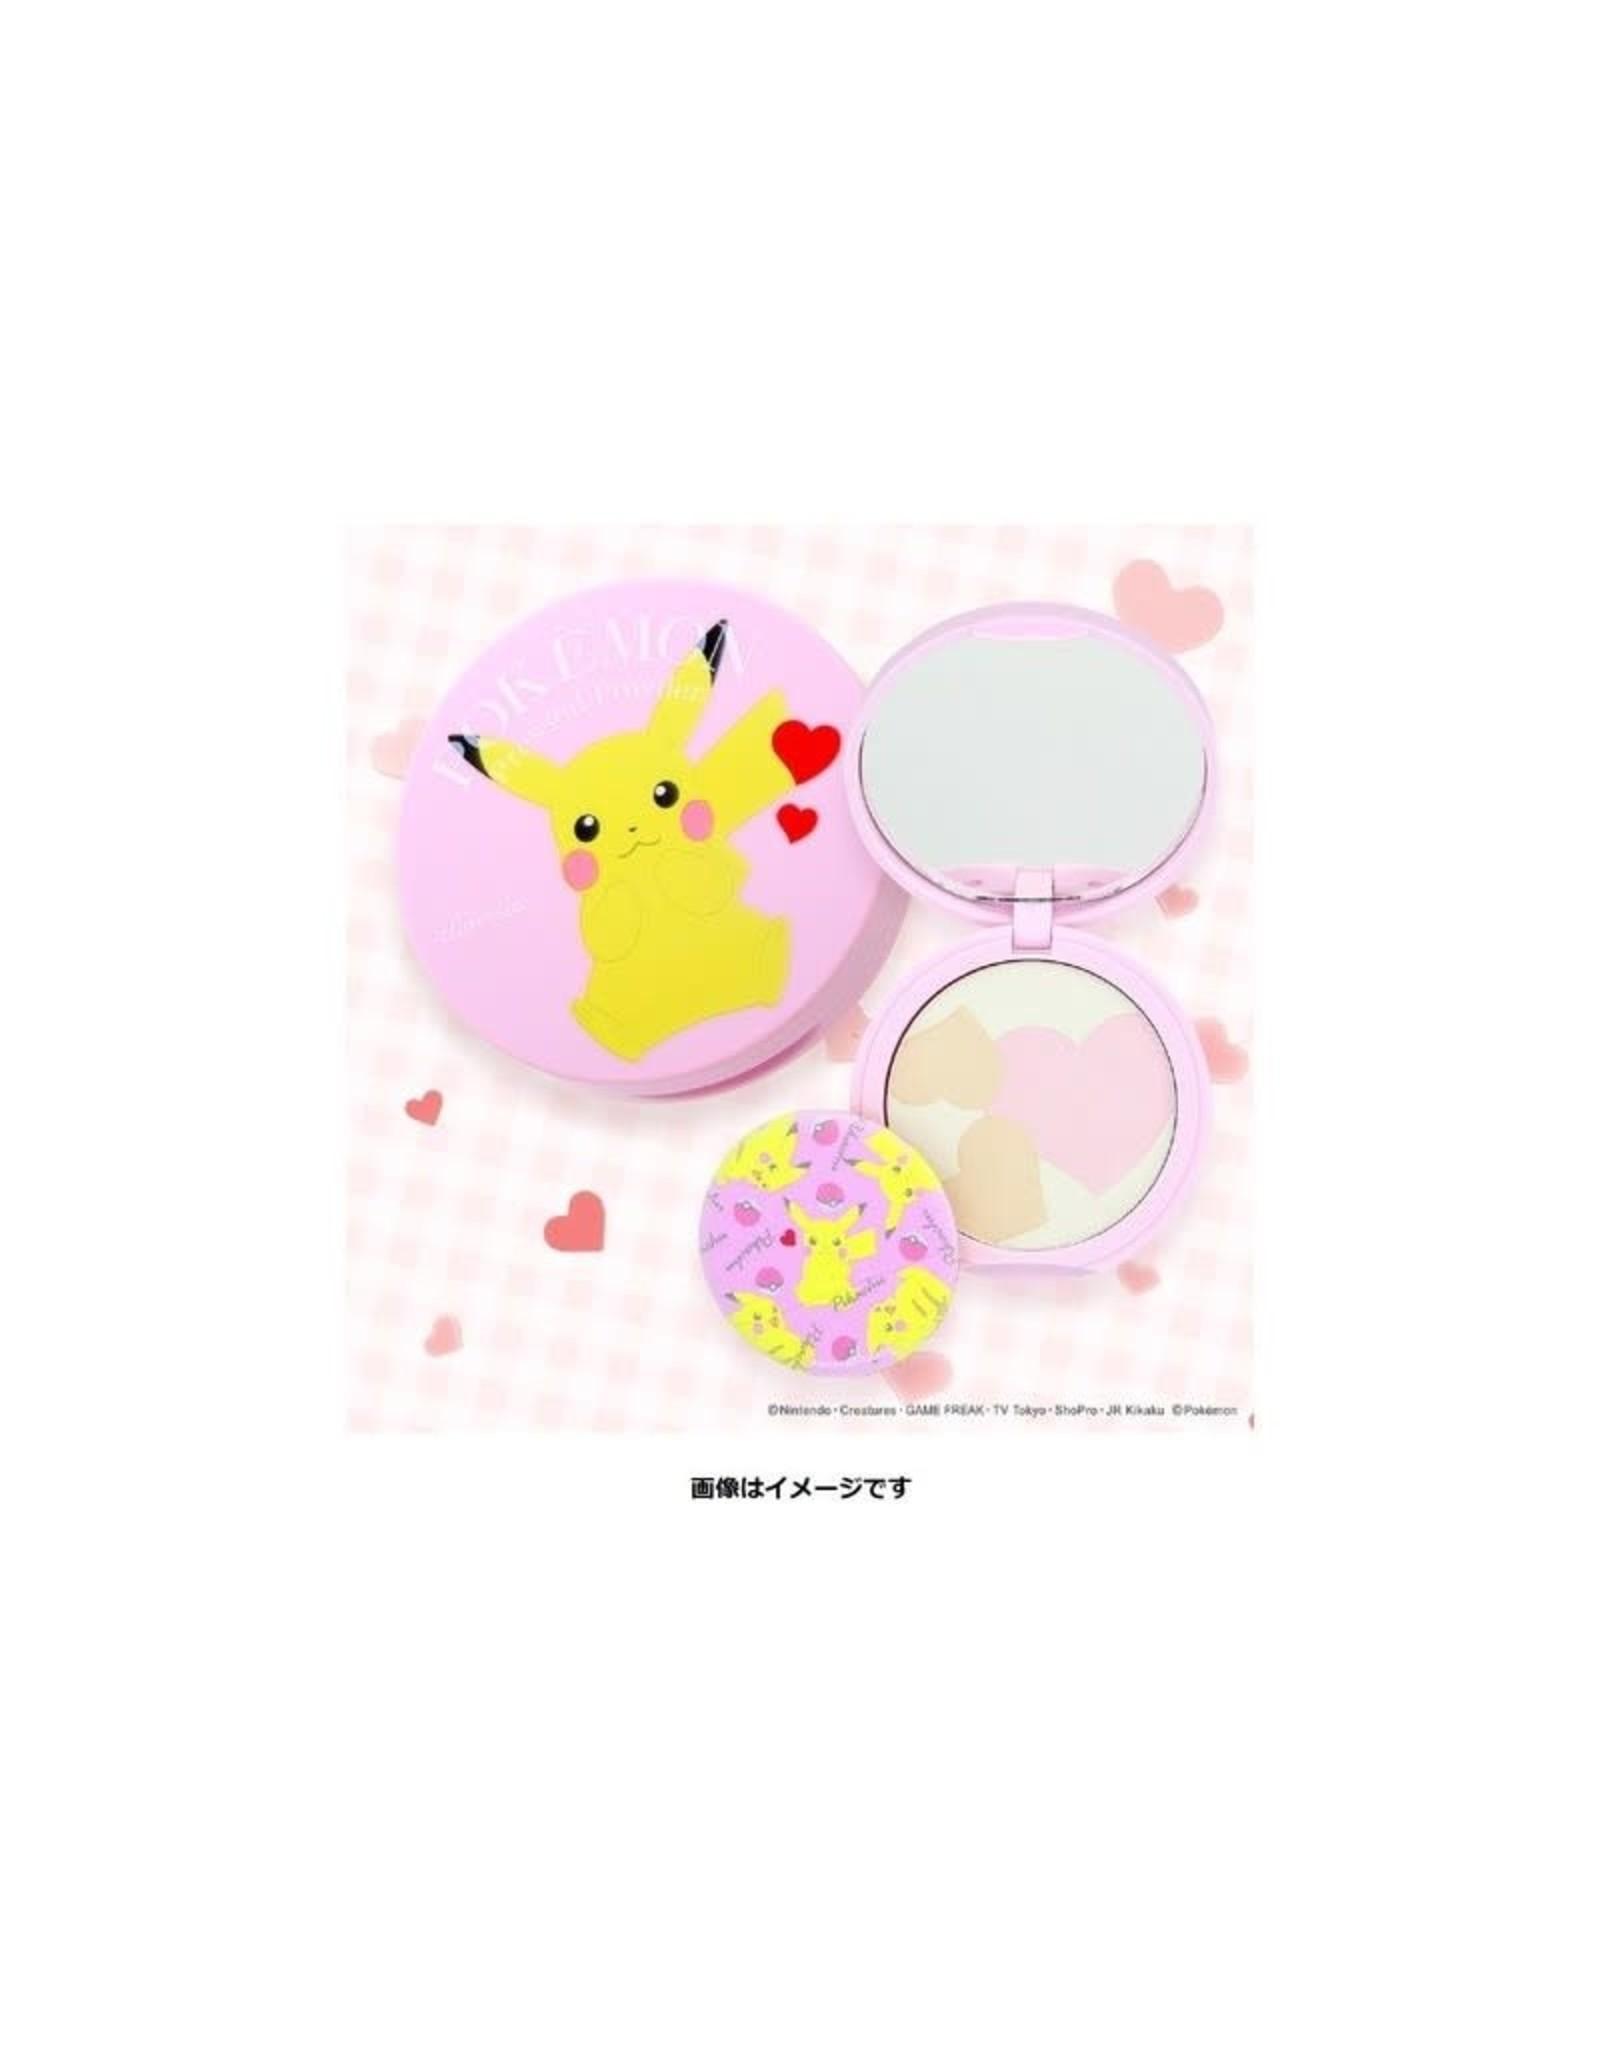 Pokemon Pressed Powder - Pikachu